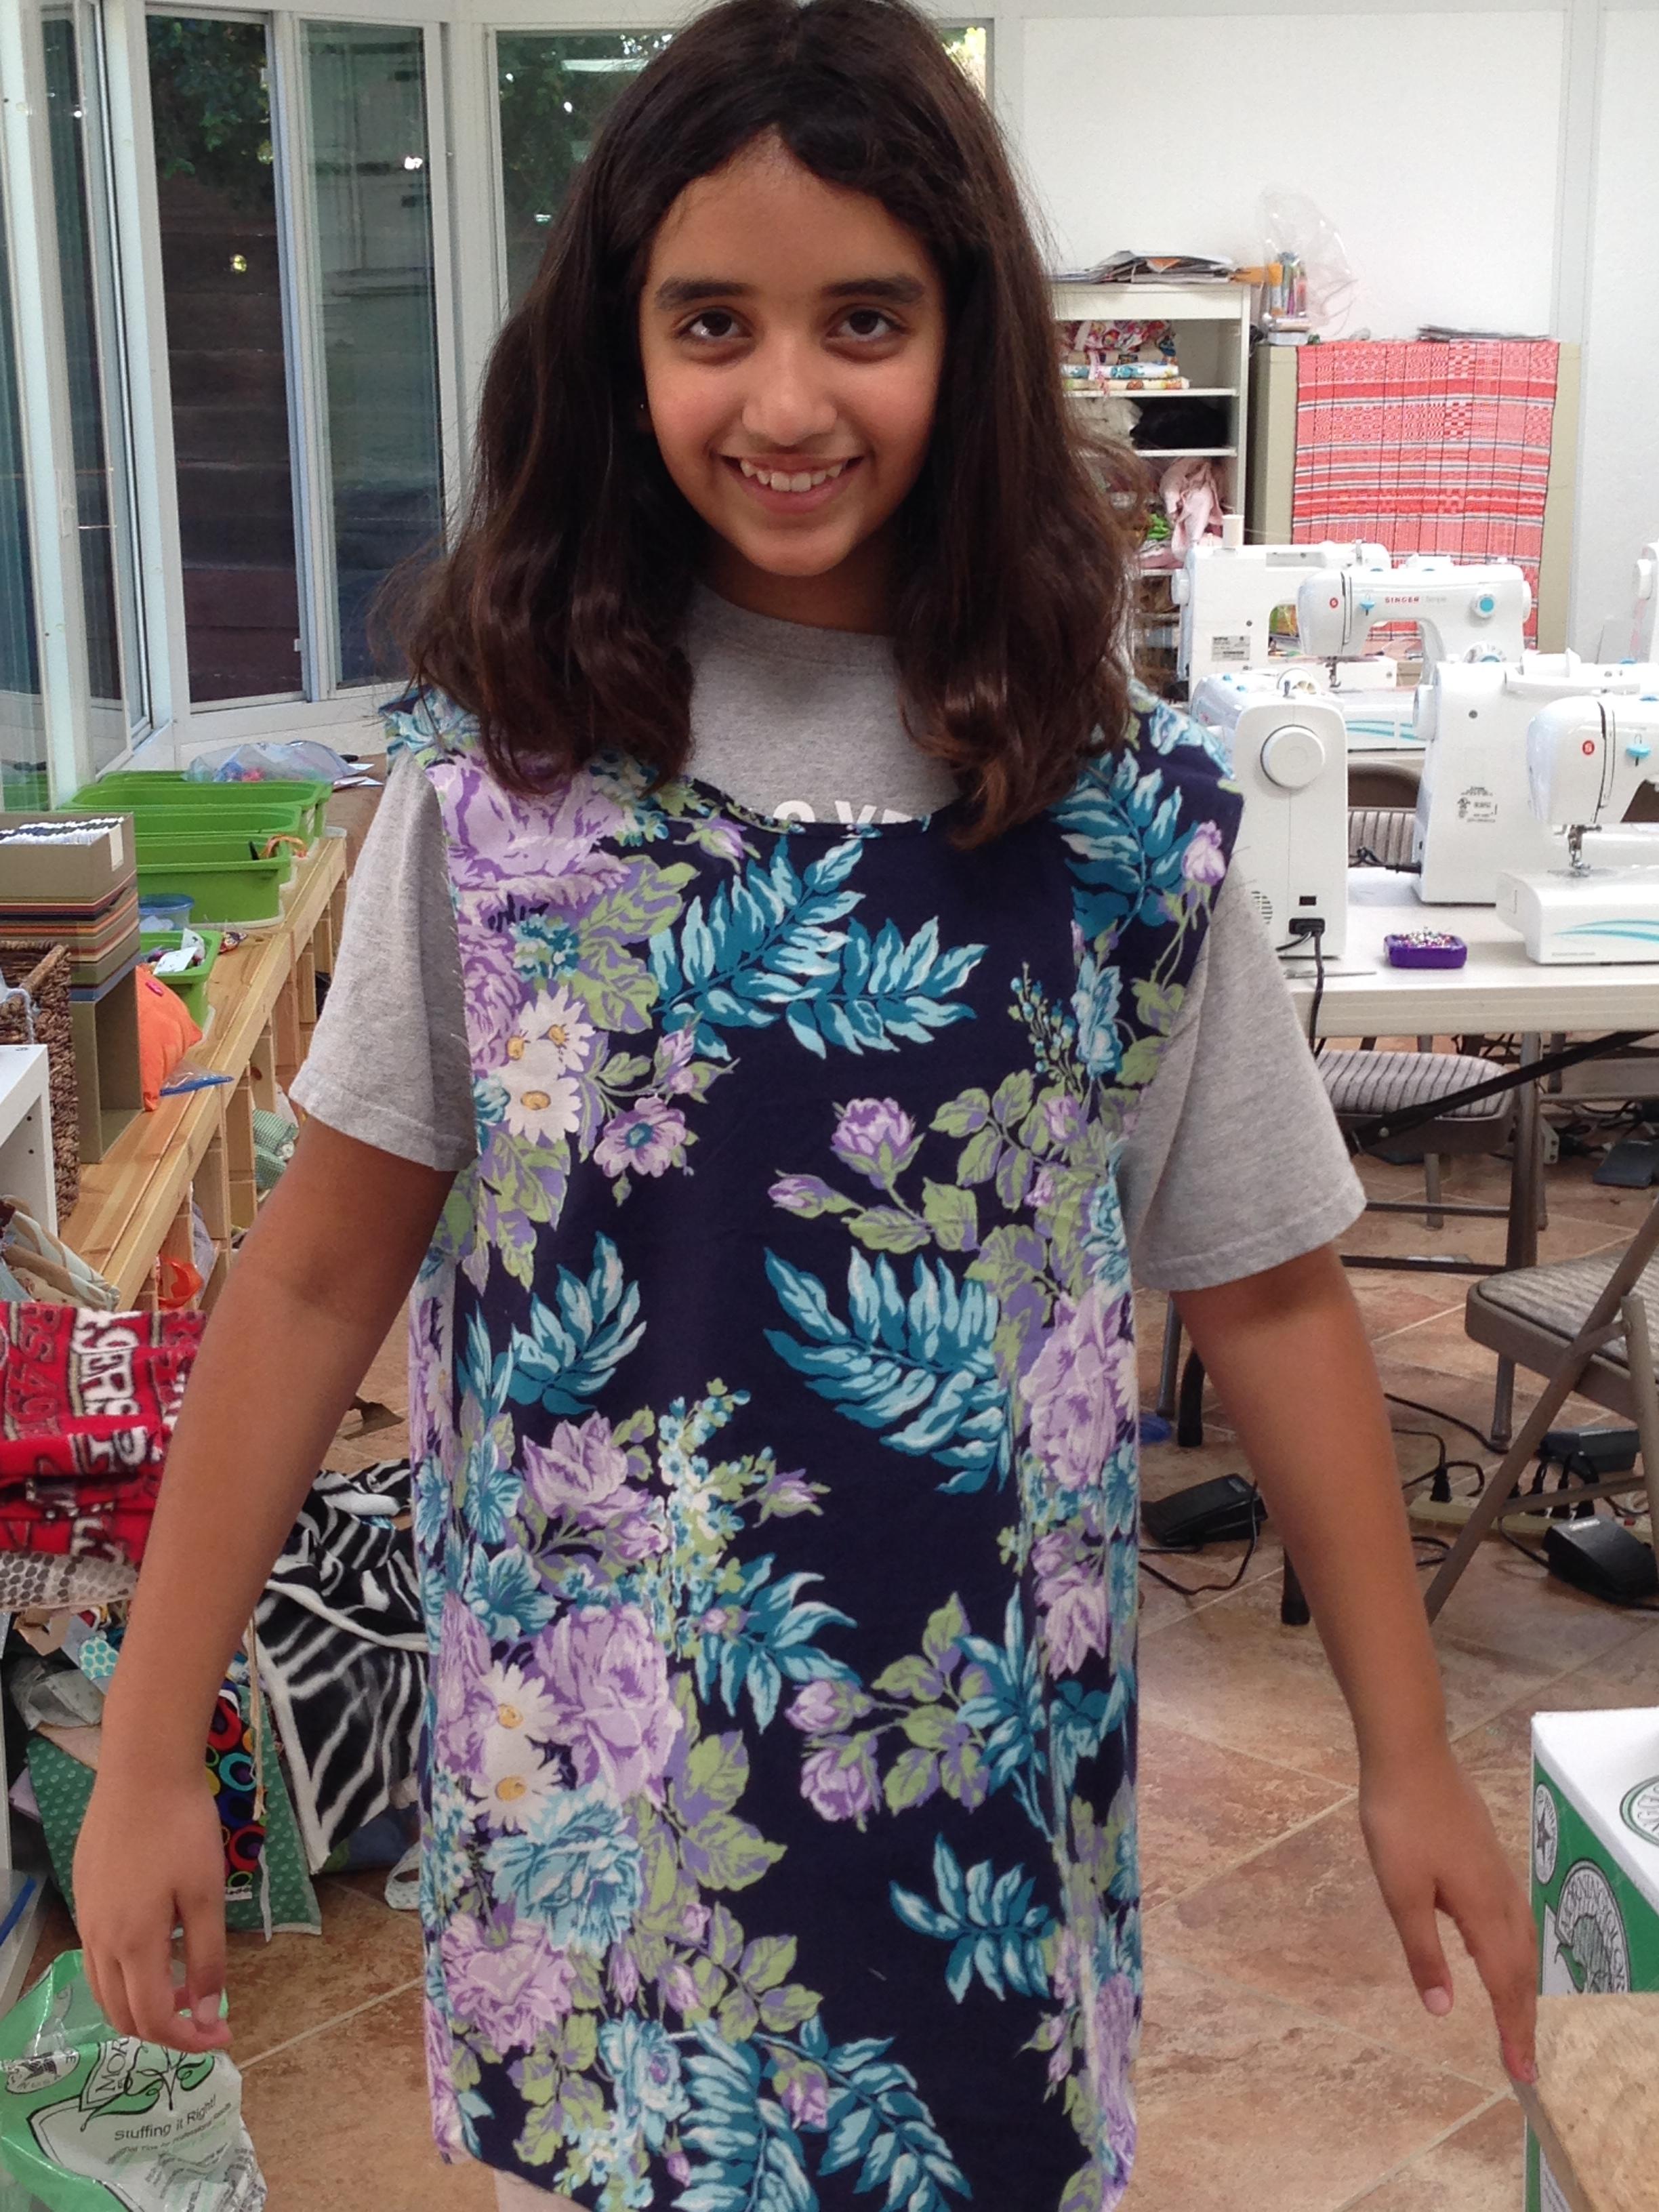 6th grader self-designed shirt.